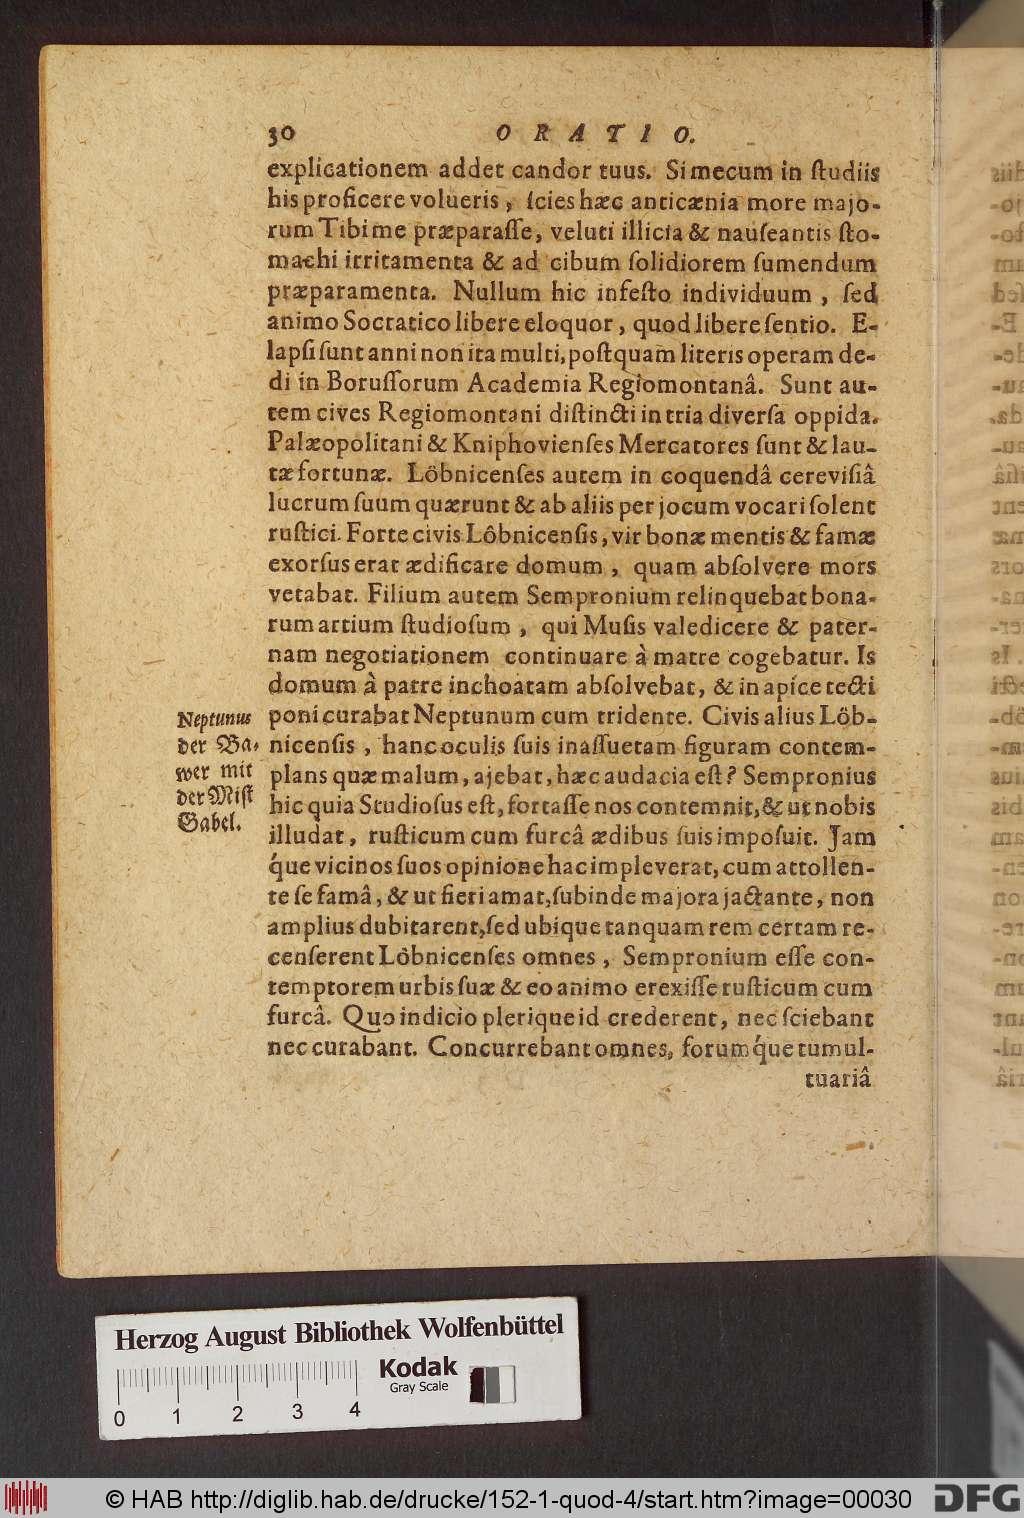 http://diglib.hab.de/drucke/152-1-quod-4/00030.jpg